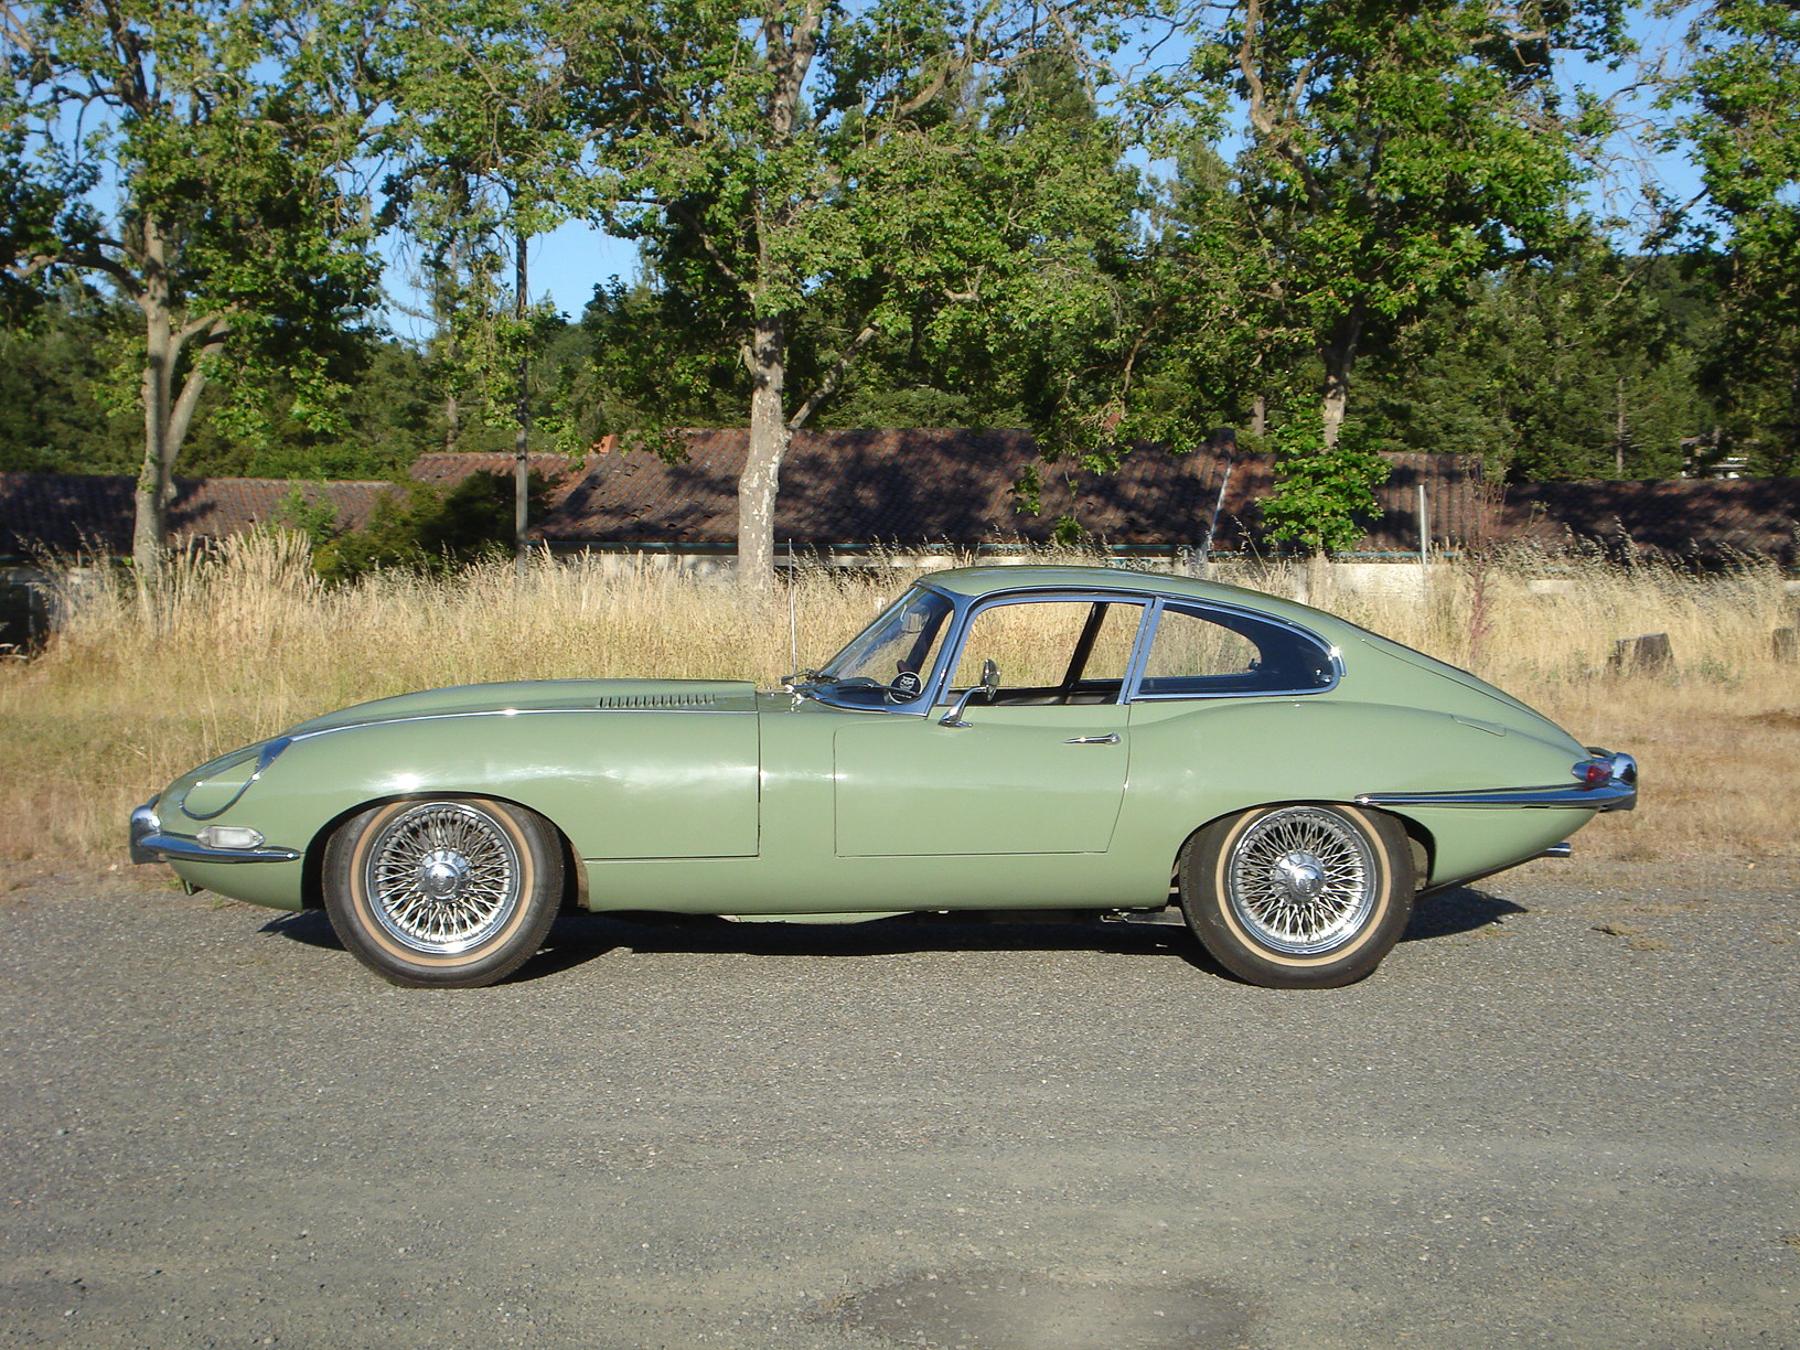 medium resolution of rent a classic car seattle jaguar